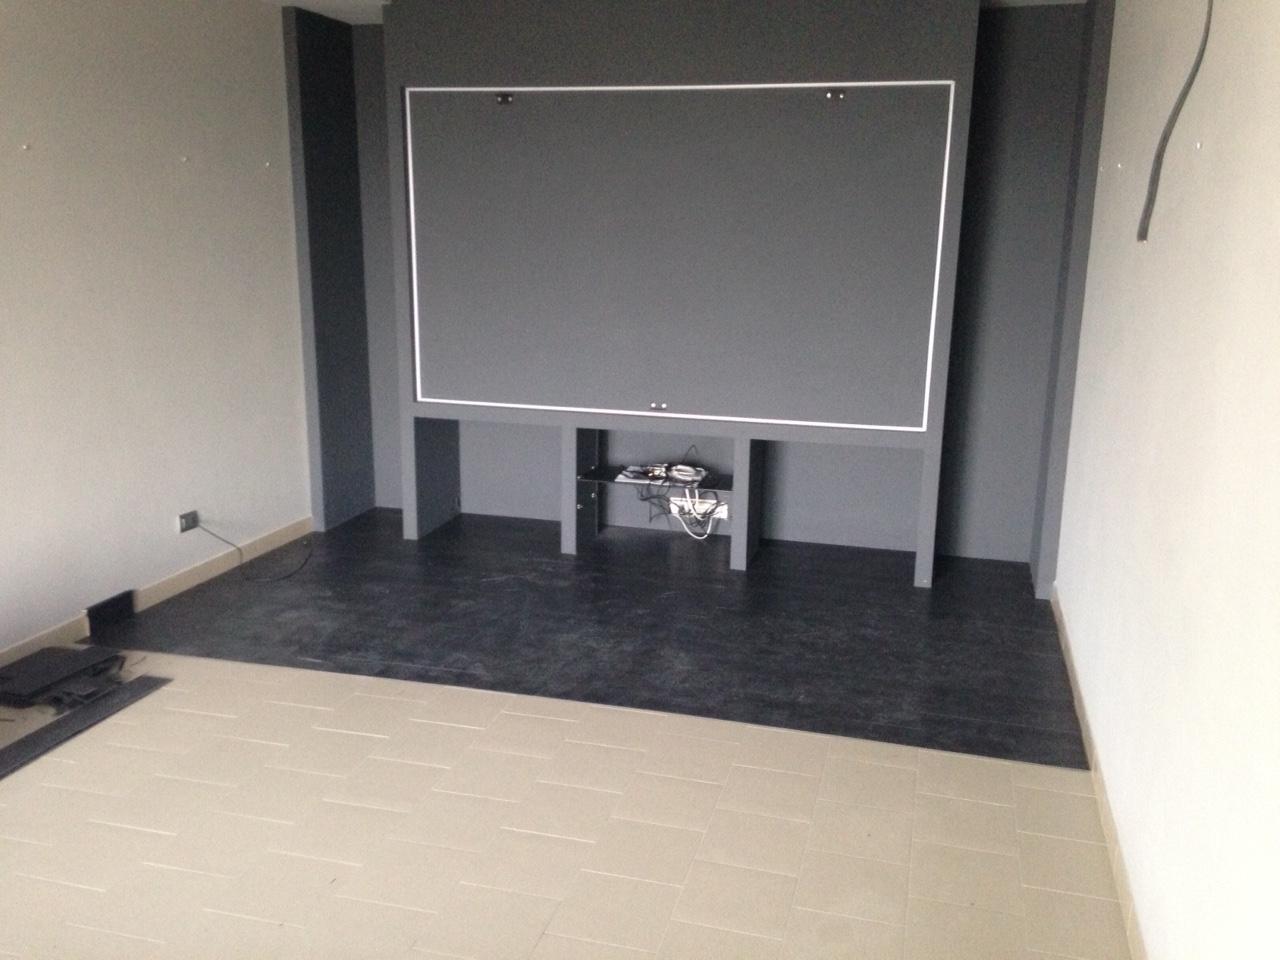 Pavimento galleggiante per sala home cinema